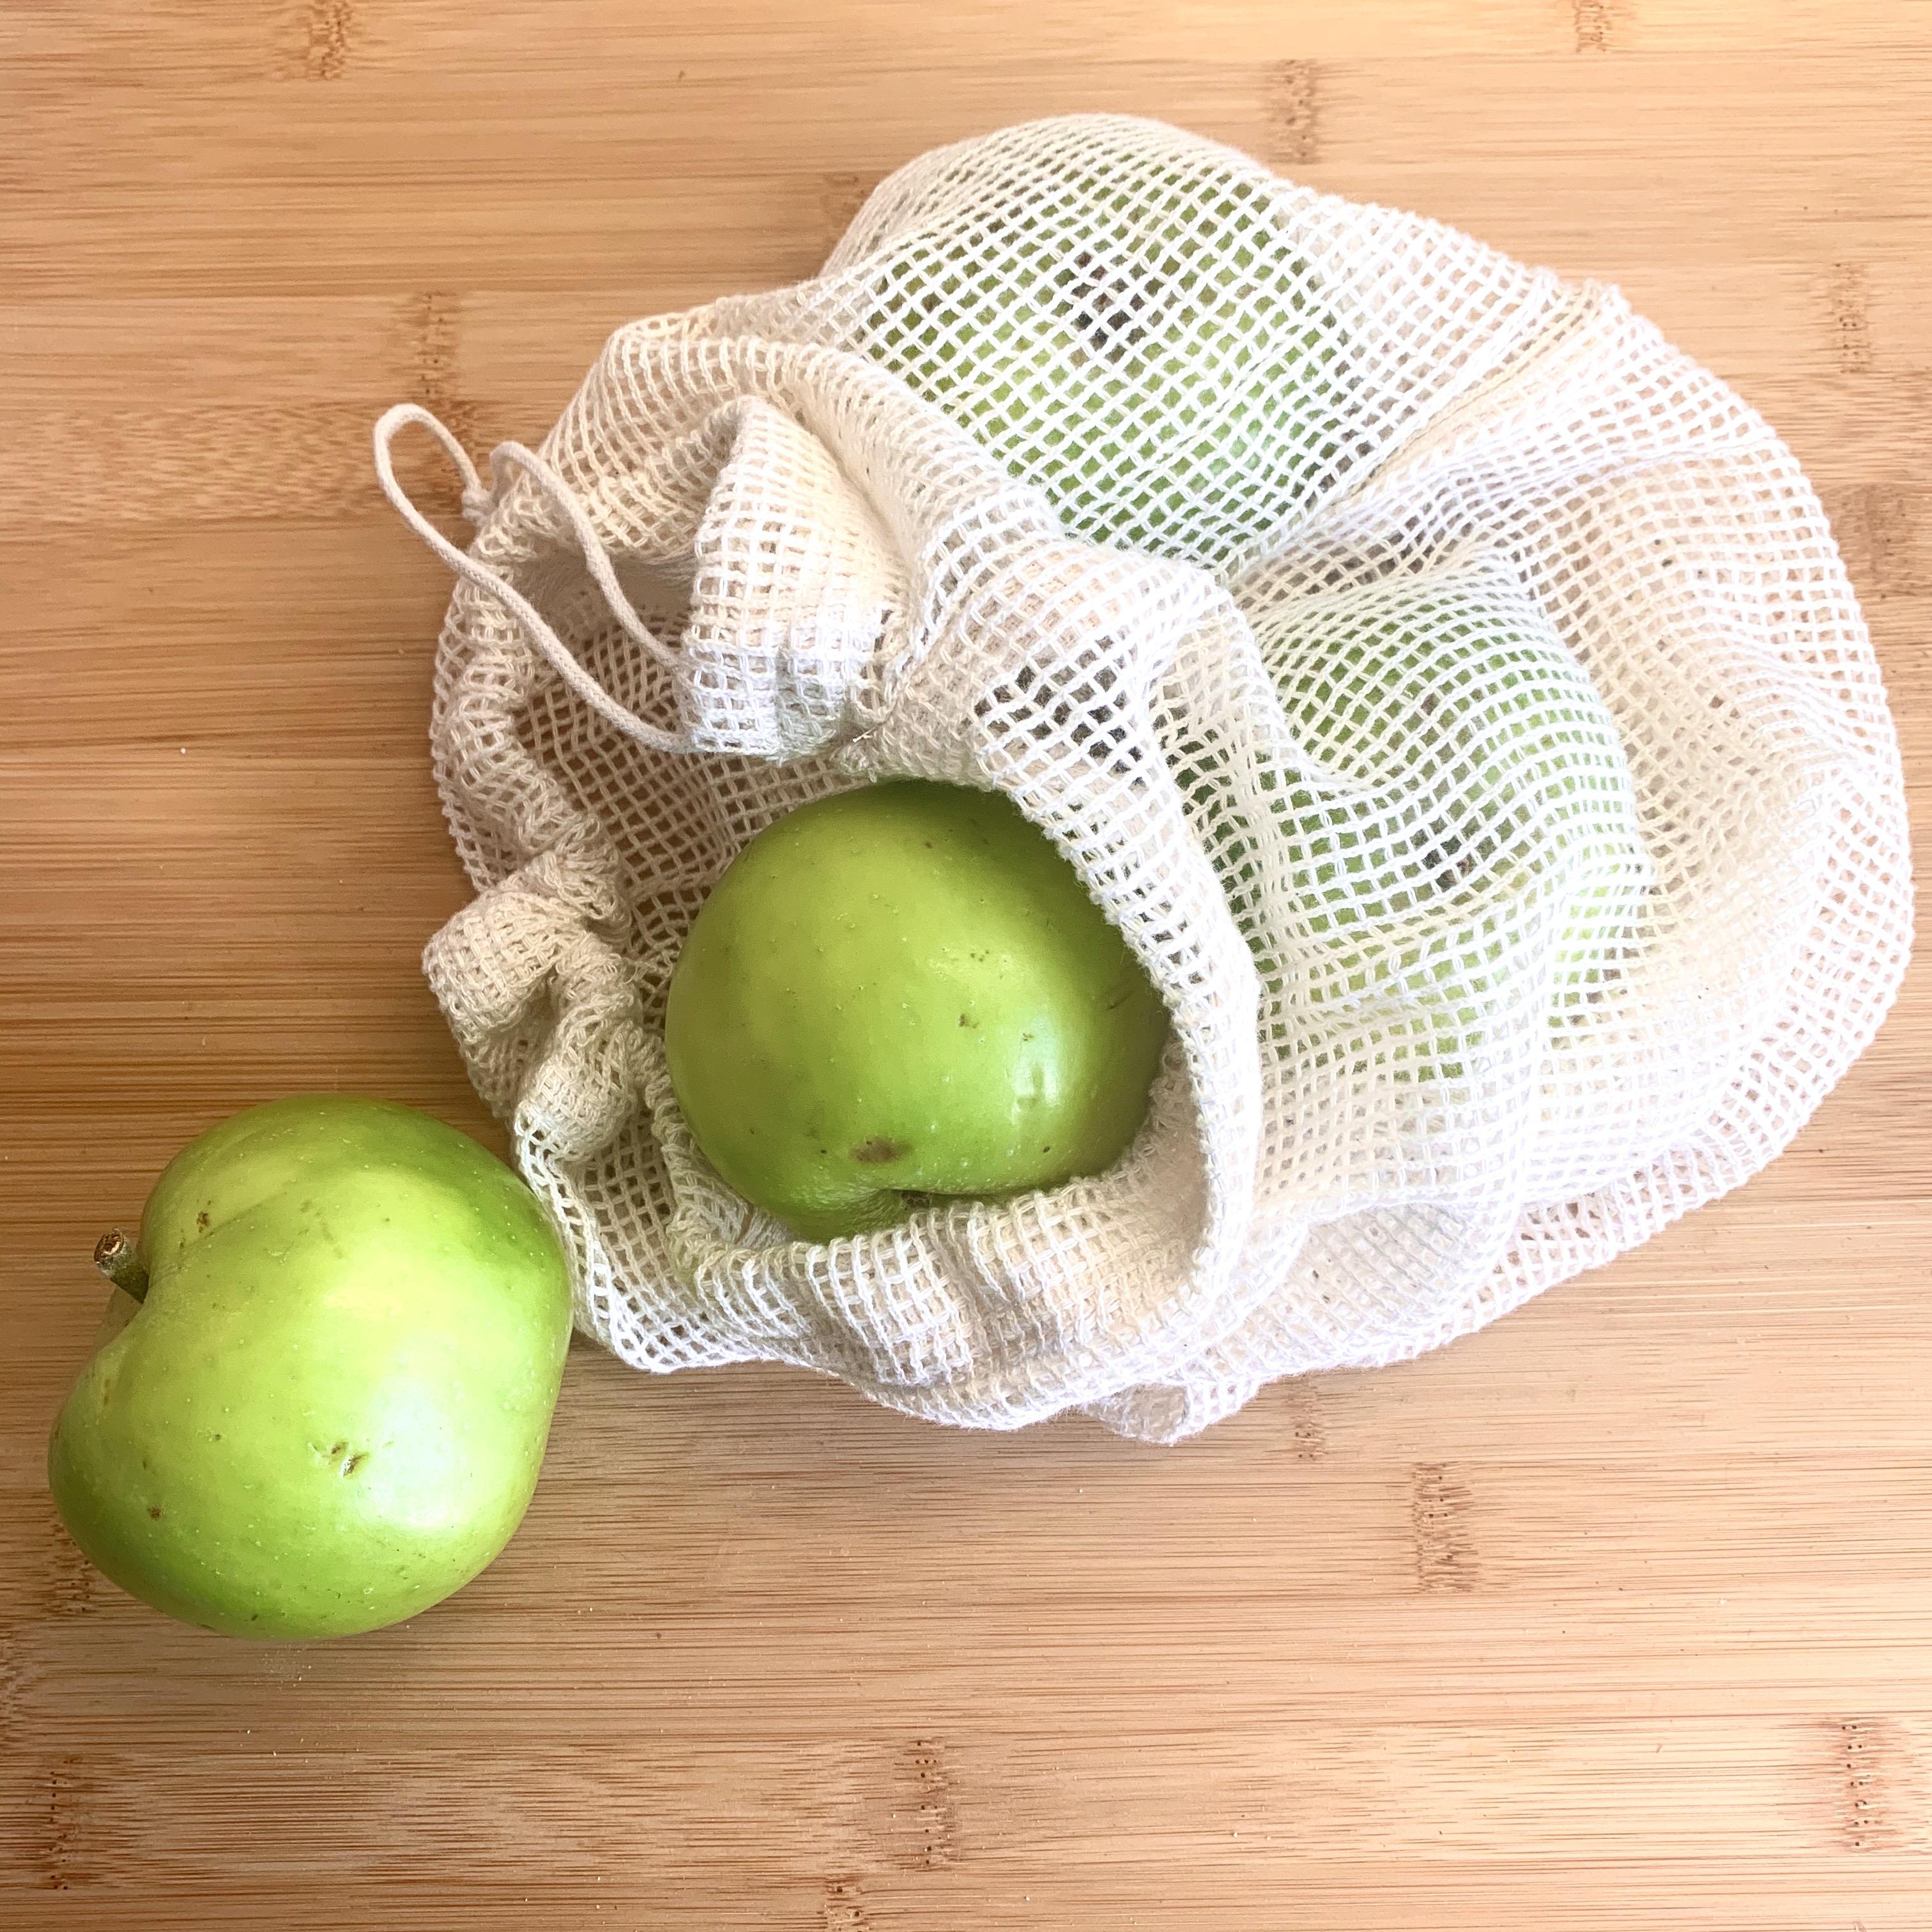 Organic Cotton Produce Bag Mesh